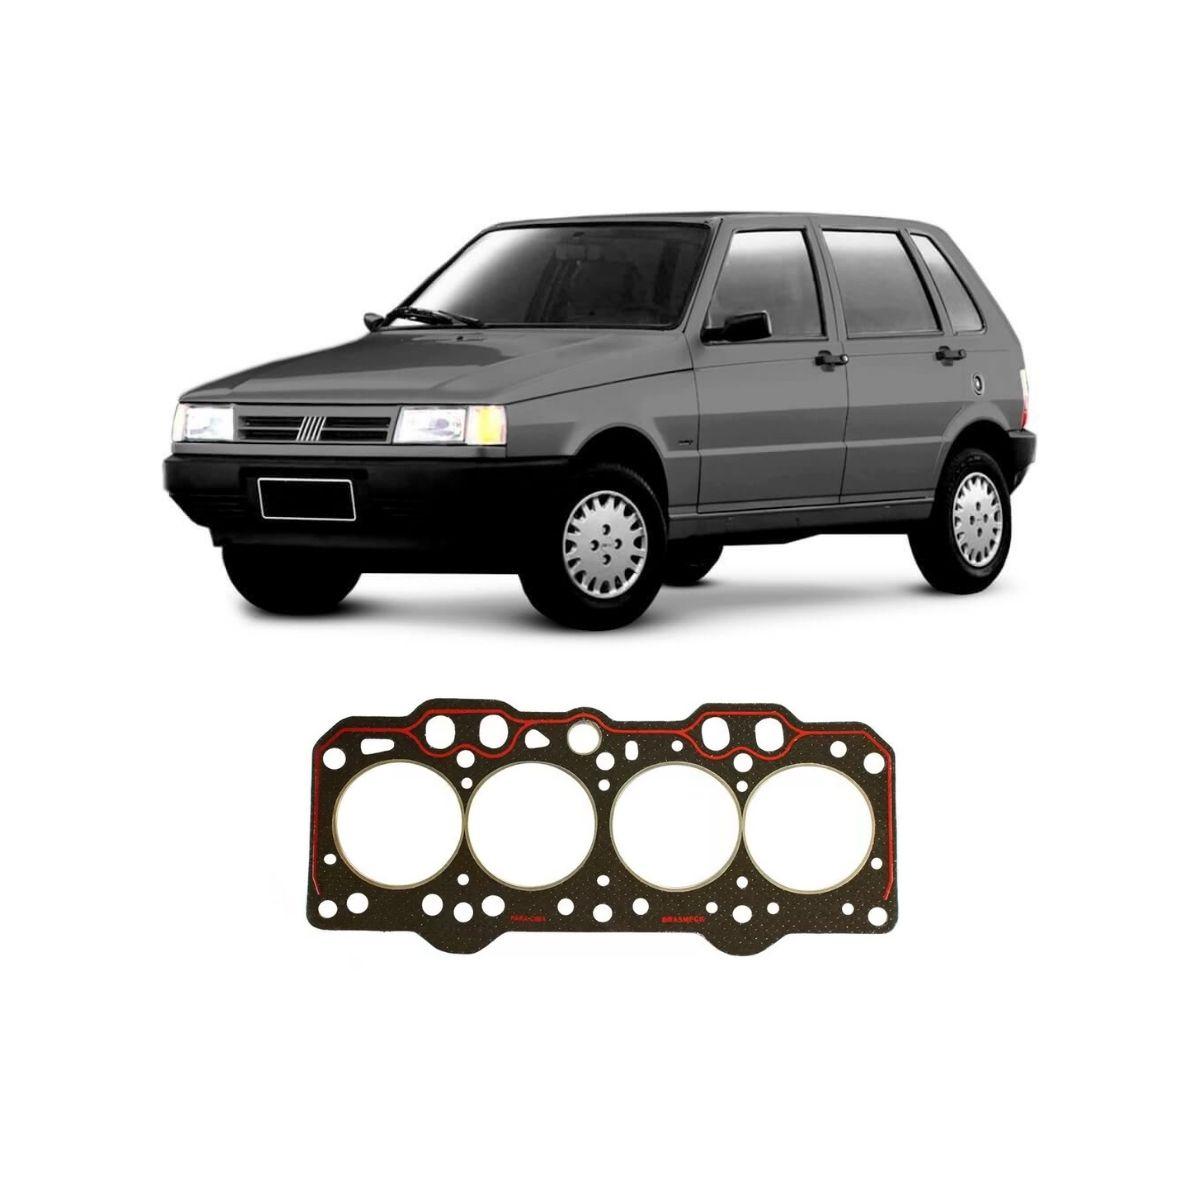 Junta Cabeçote Baspack Fiat Uno 1985/1991